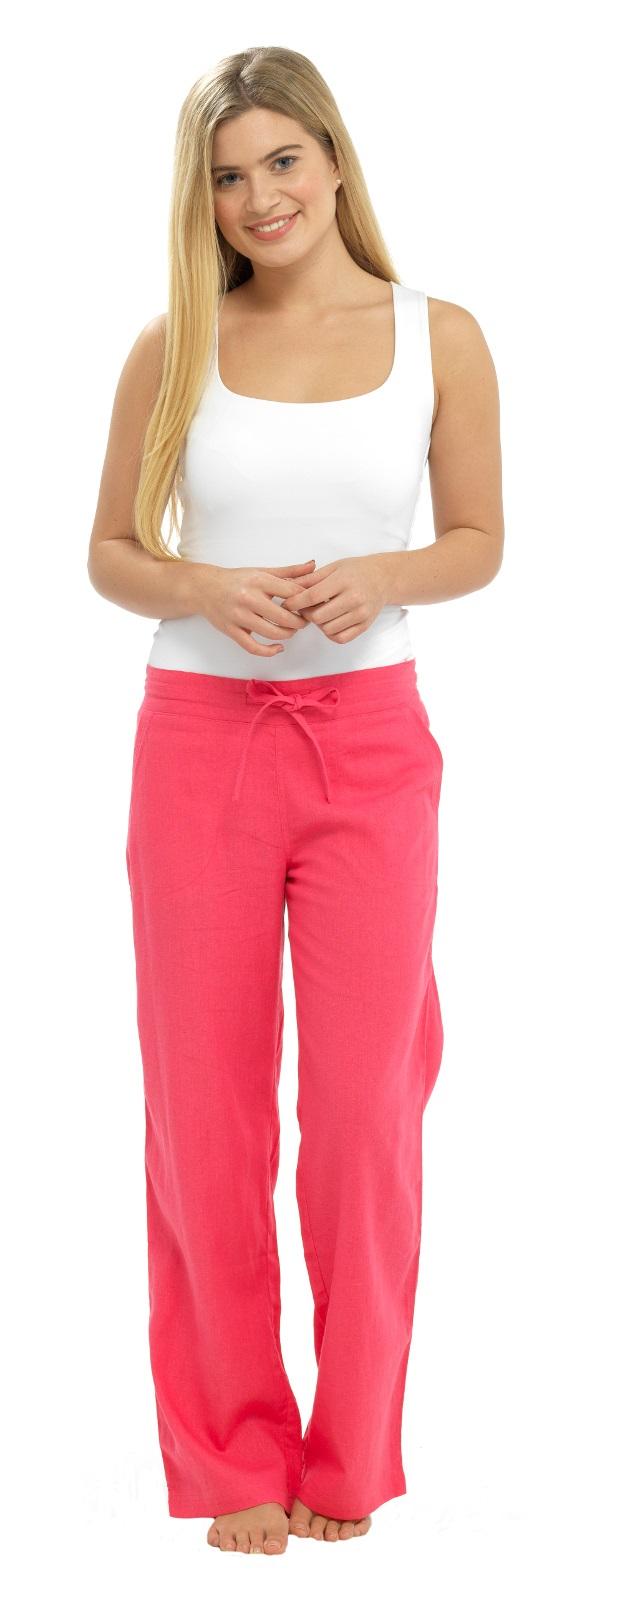 Elegant Elastic Waist Cotton Linen Women Harem Pants Solid Yellow Red Gray Casual Summer Pants Capri ...